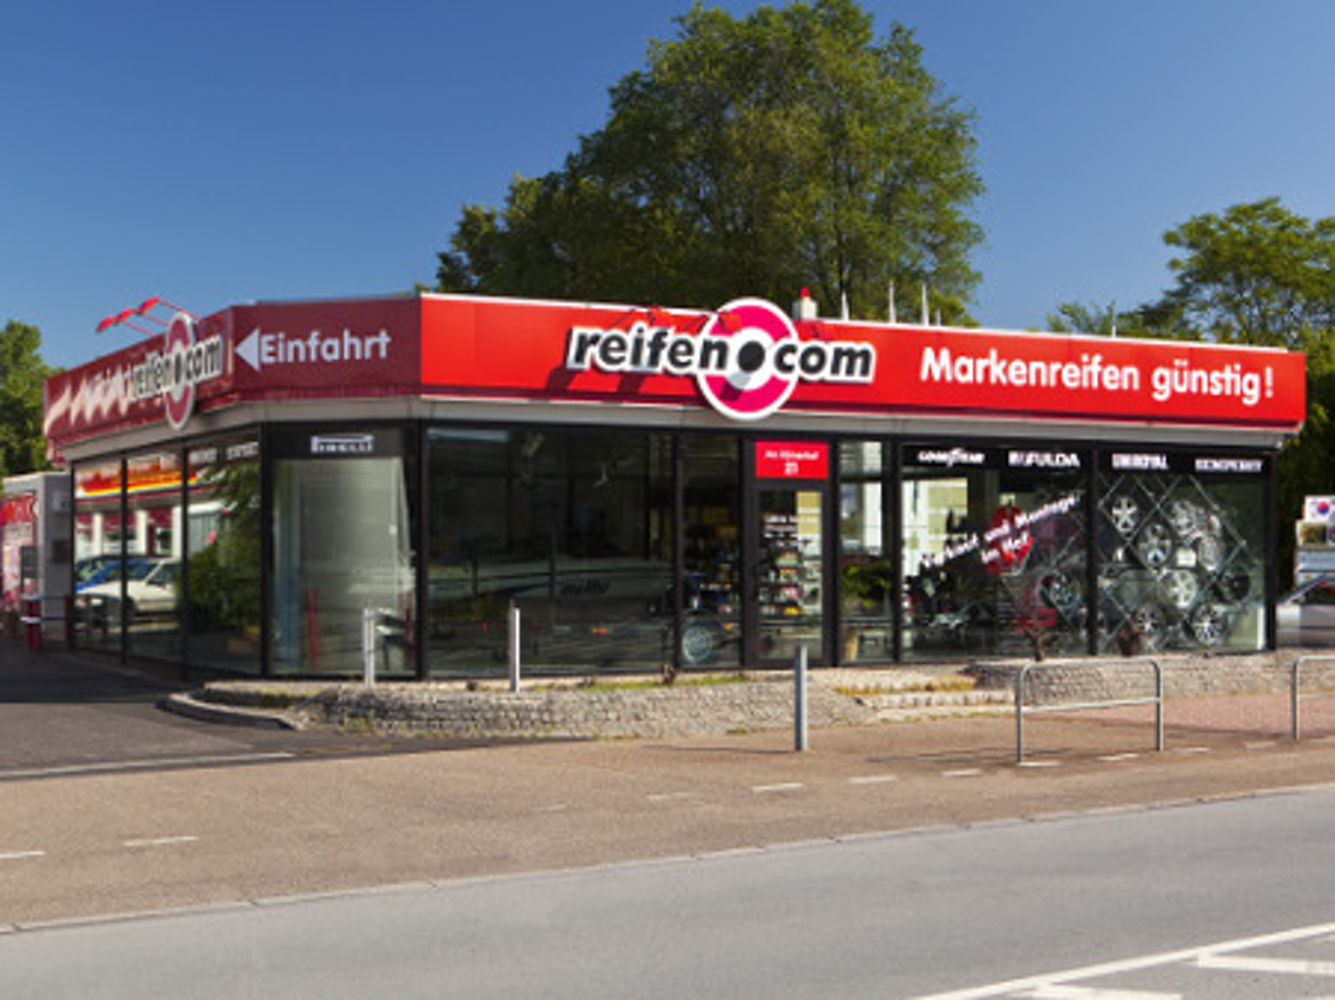 reifen.com-branch in Frankfurt Bockenheim